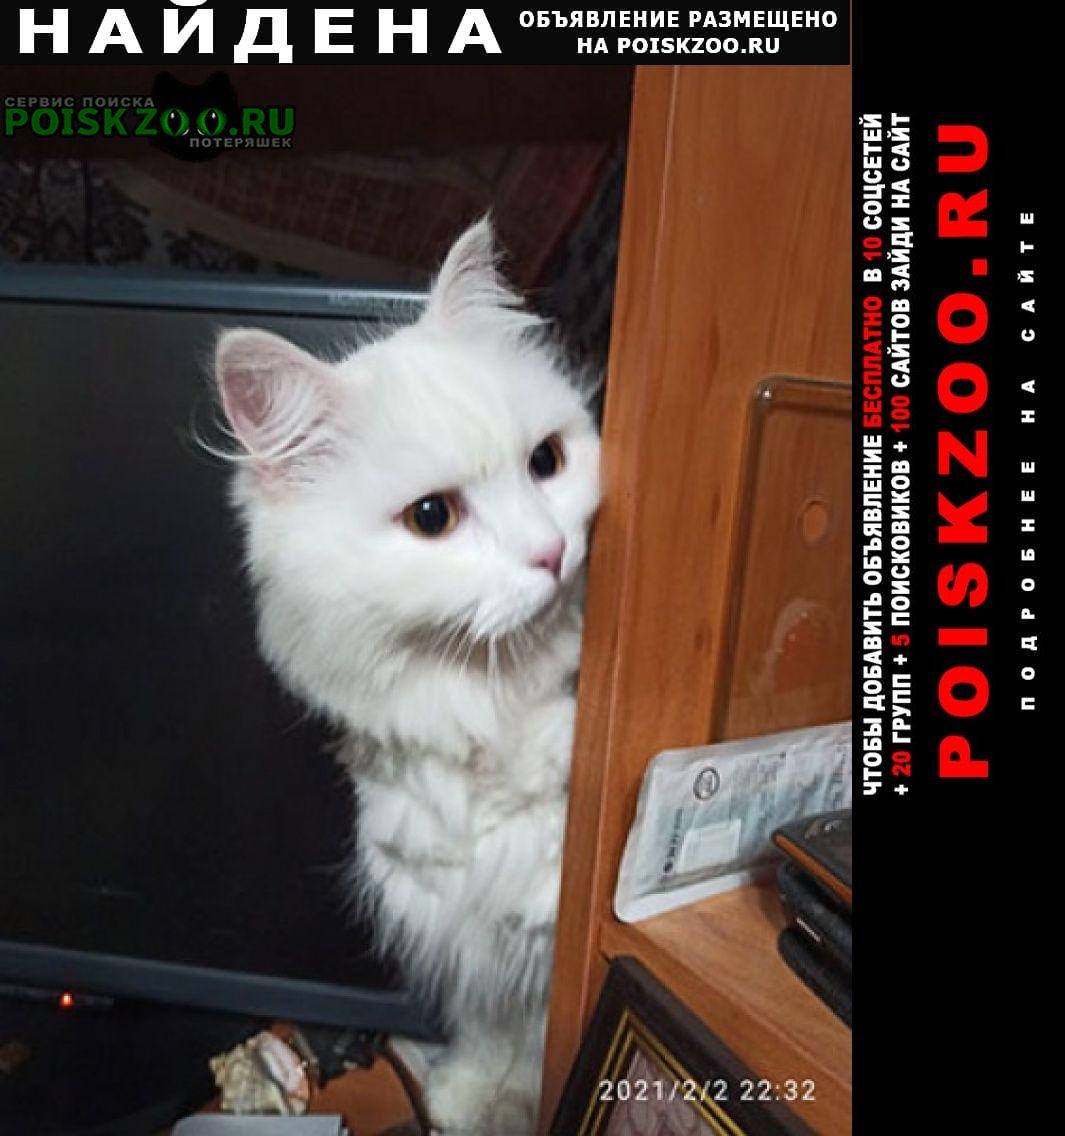 Найдена кошка мкр. сакраменто Балашиха